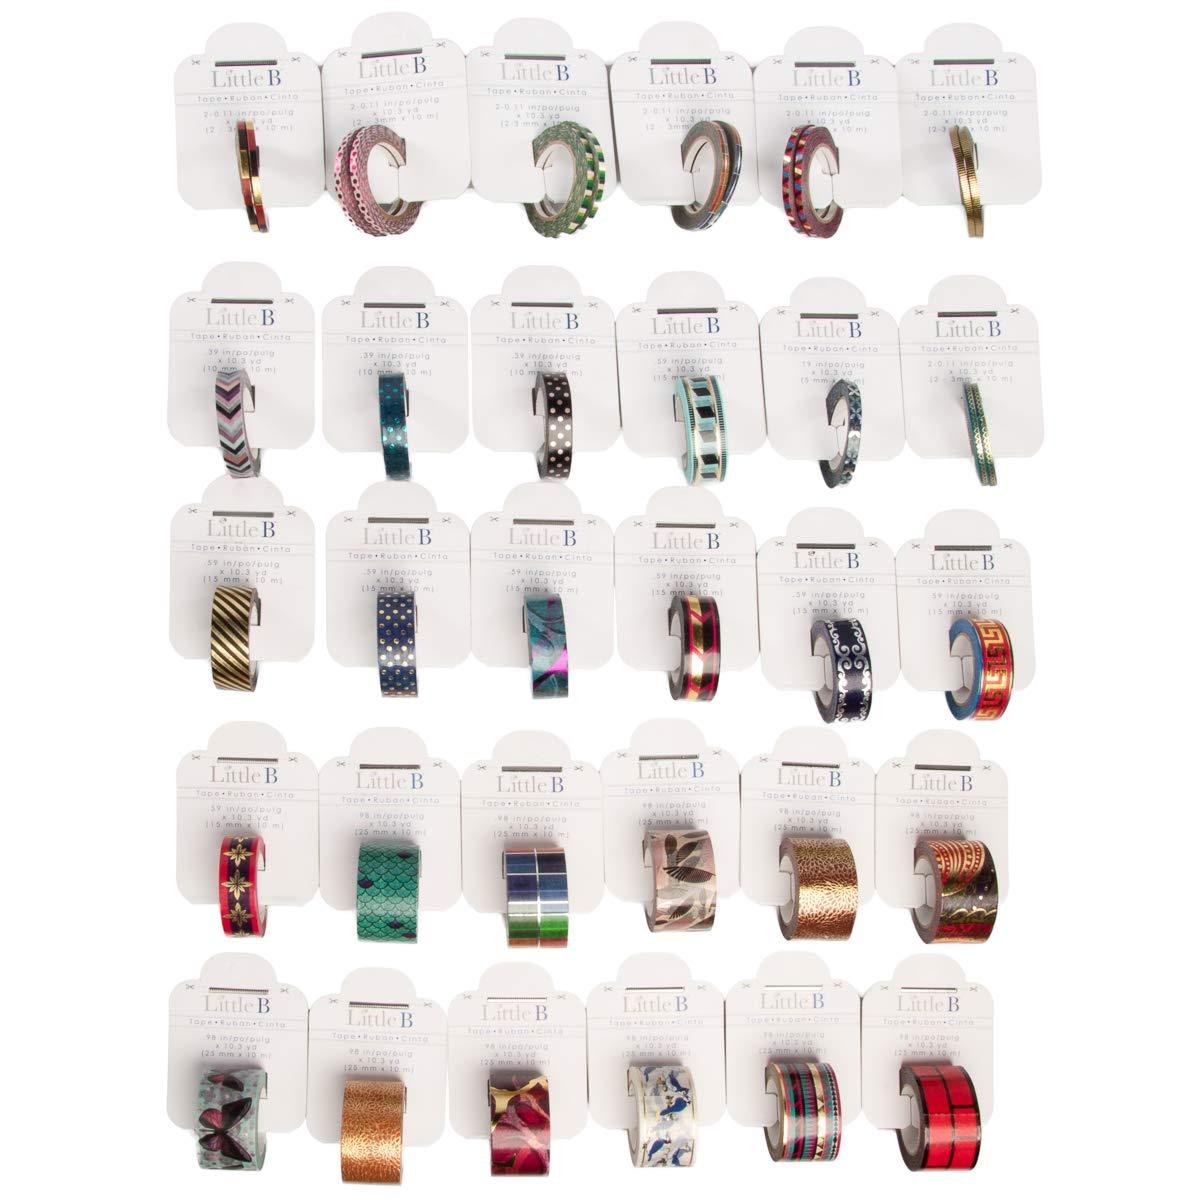 Little B (30 Rolls Assorted Thick & Thin Washi Tape Set Bulk Decorative Colored Masking Tape DIY Crafts